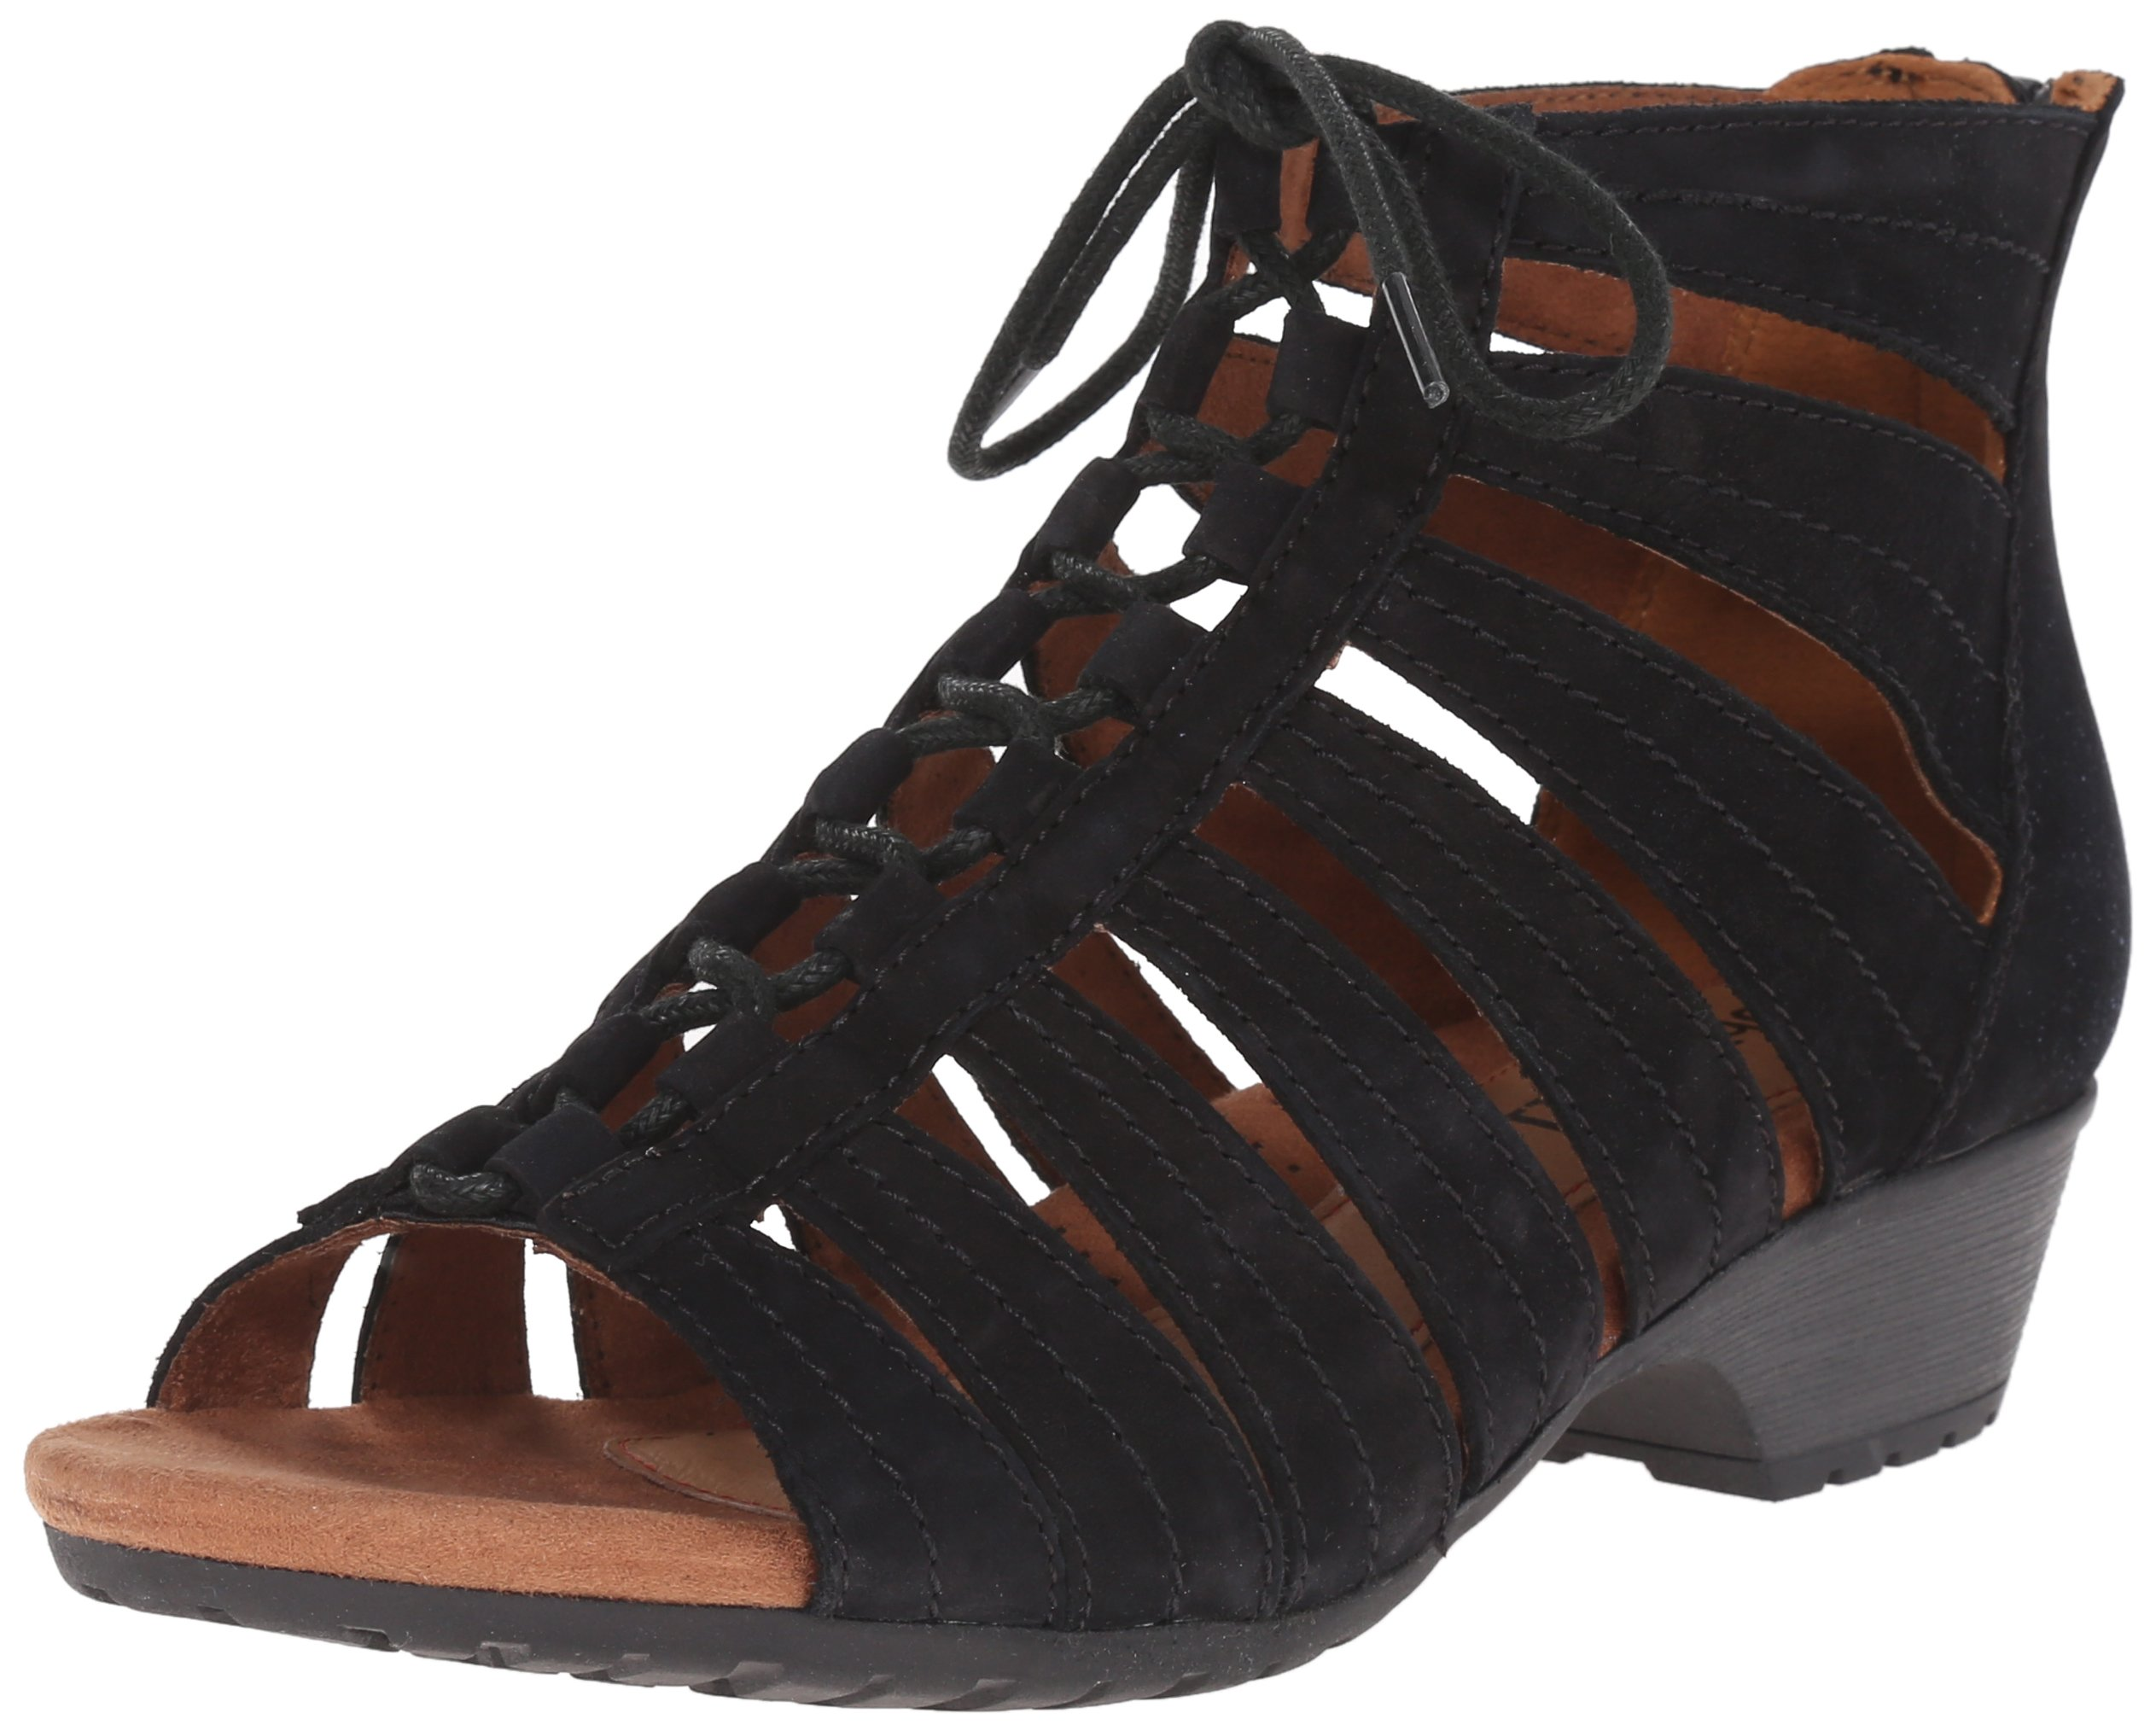 Cobb Hill Rockport Women's Gabby-CH Heeled Sandal, Black, 6.5 M US